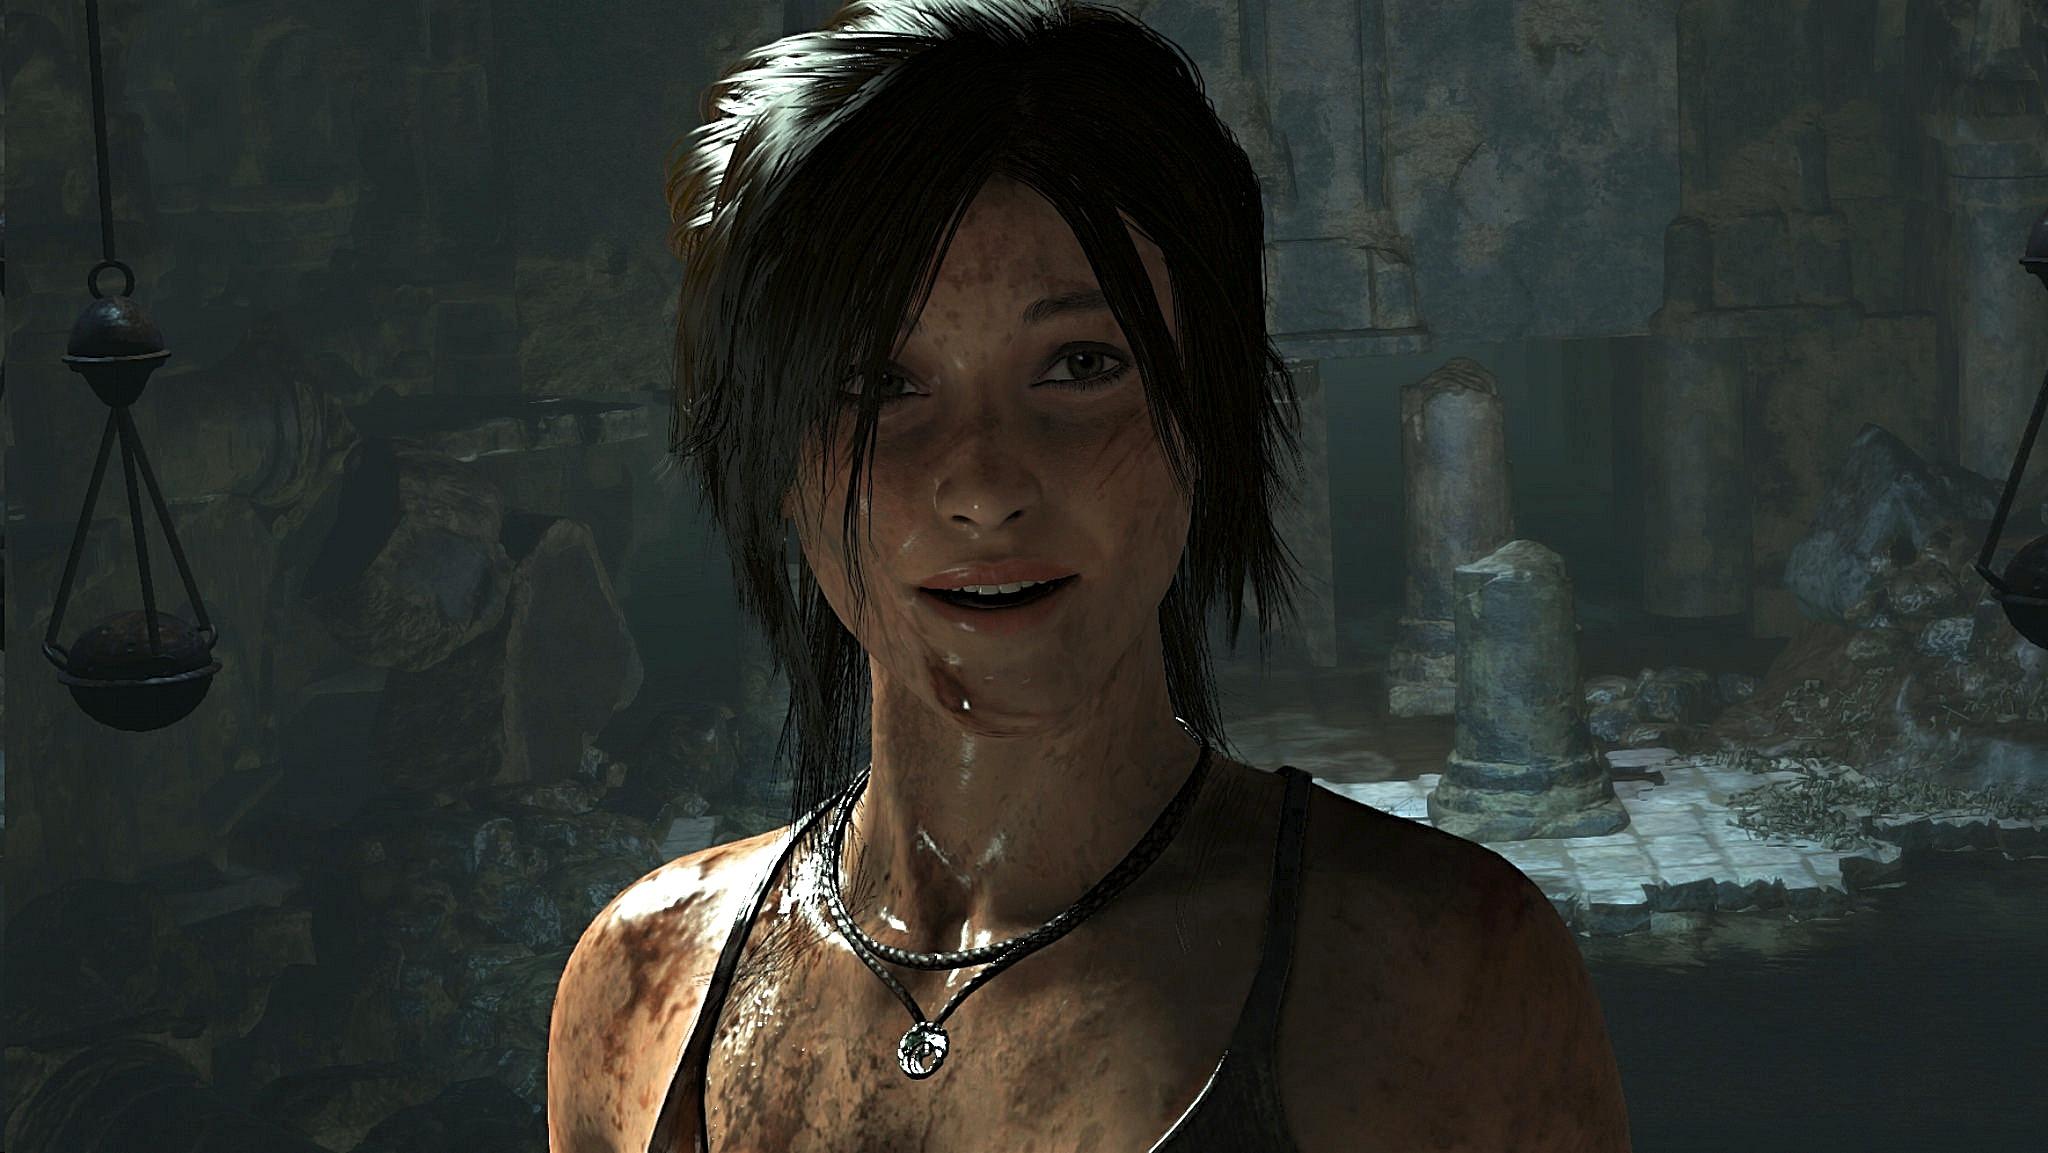 137625258_b (3).jpg - Rise of the Tomb Raider